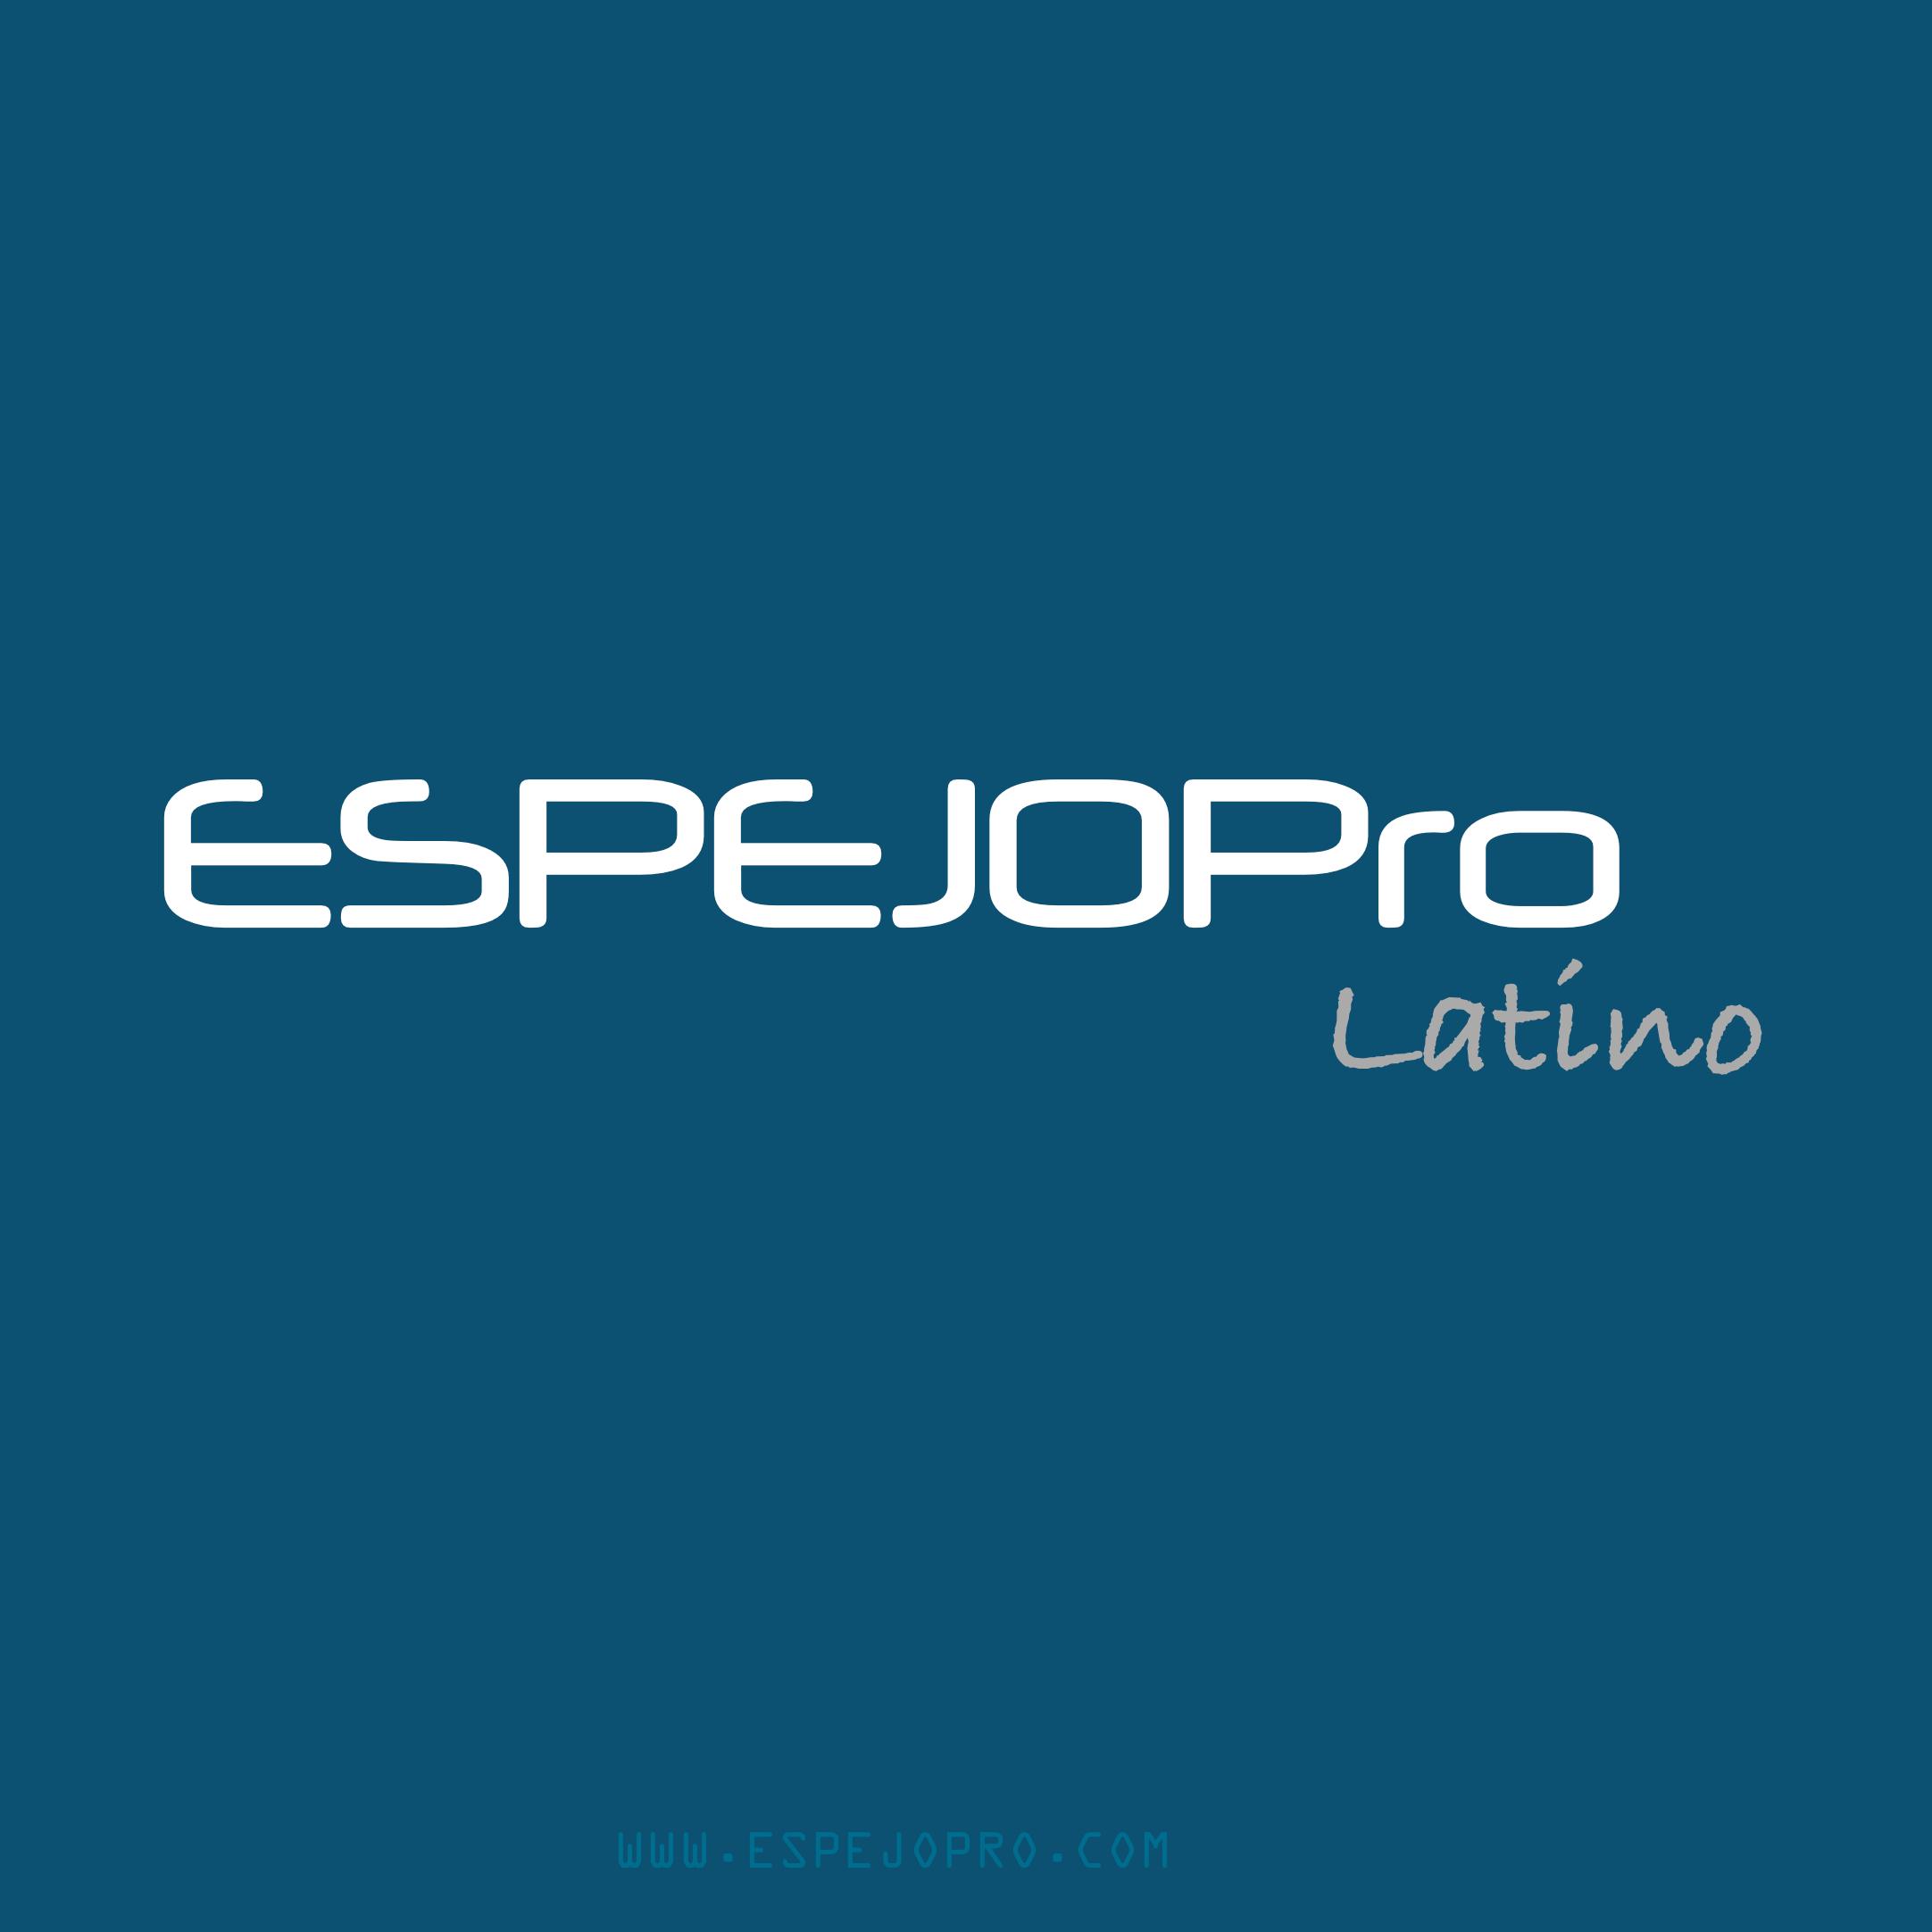 EspejoPro Latino